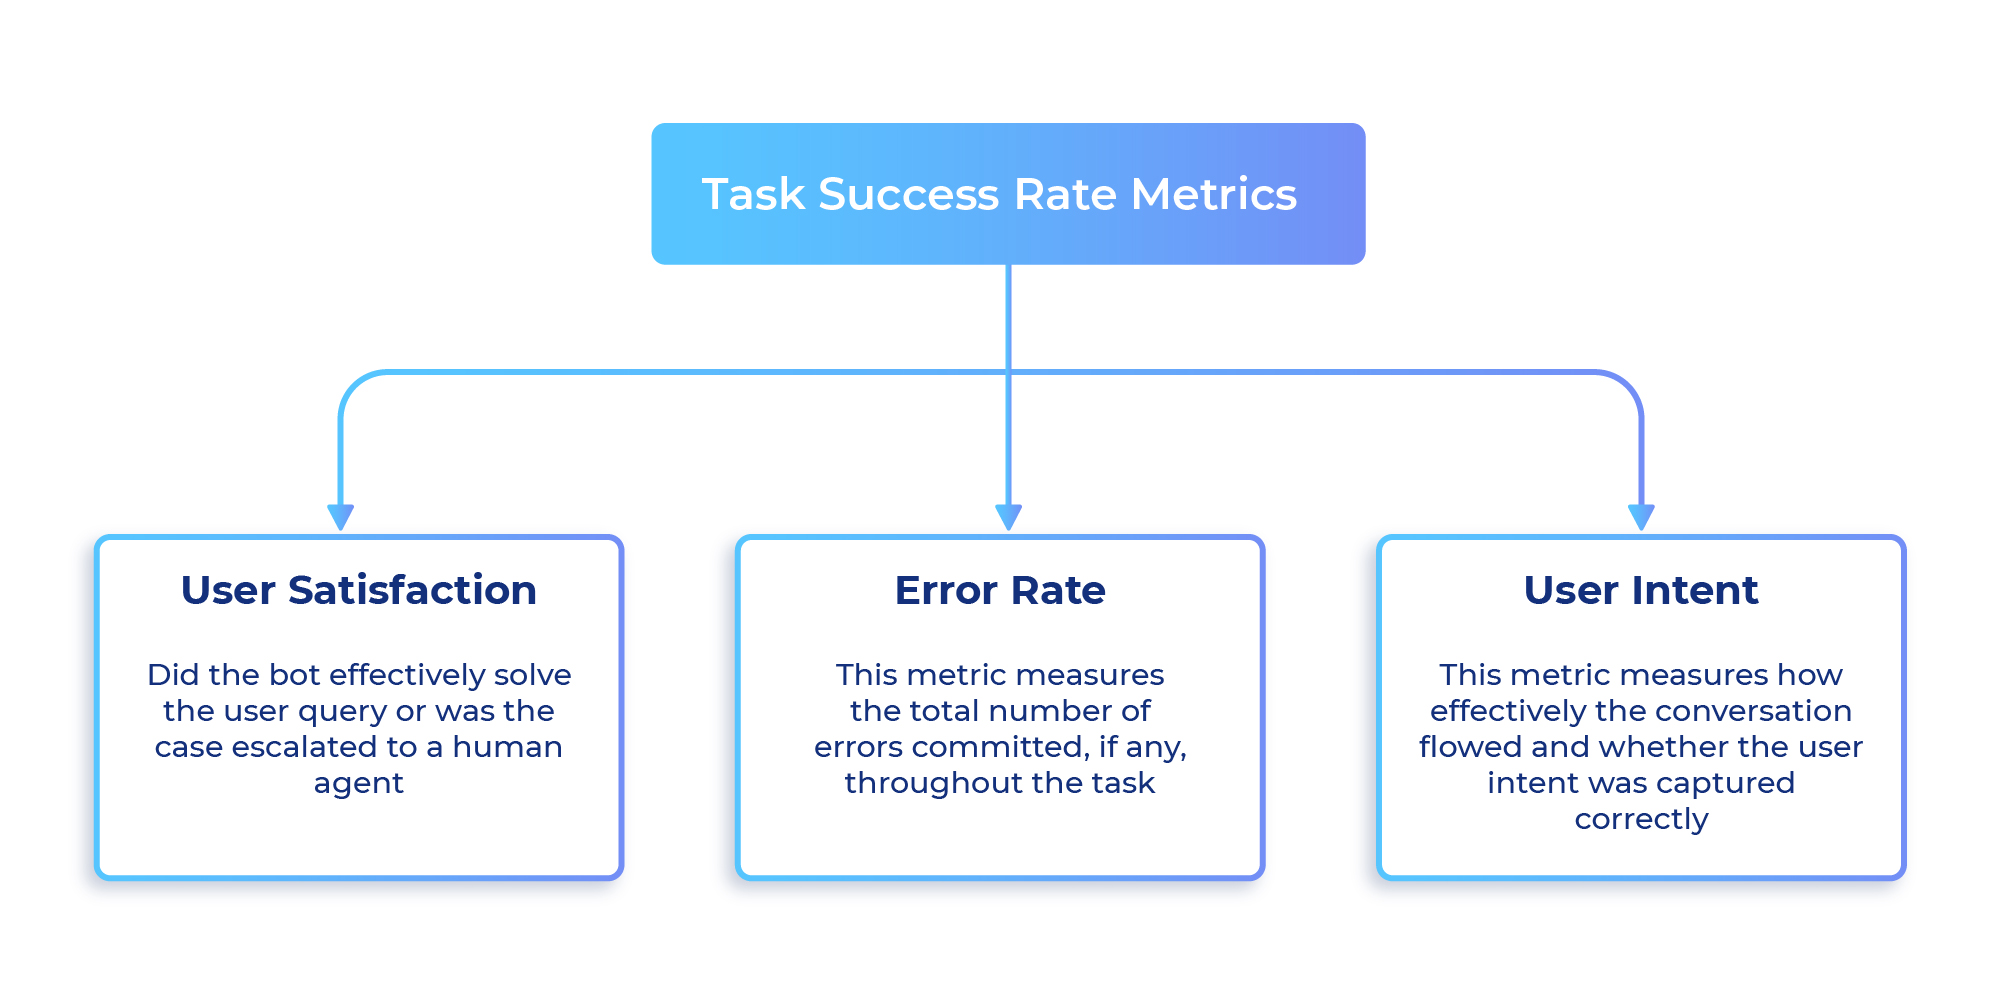 Task Success Rate Metrics